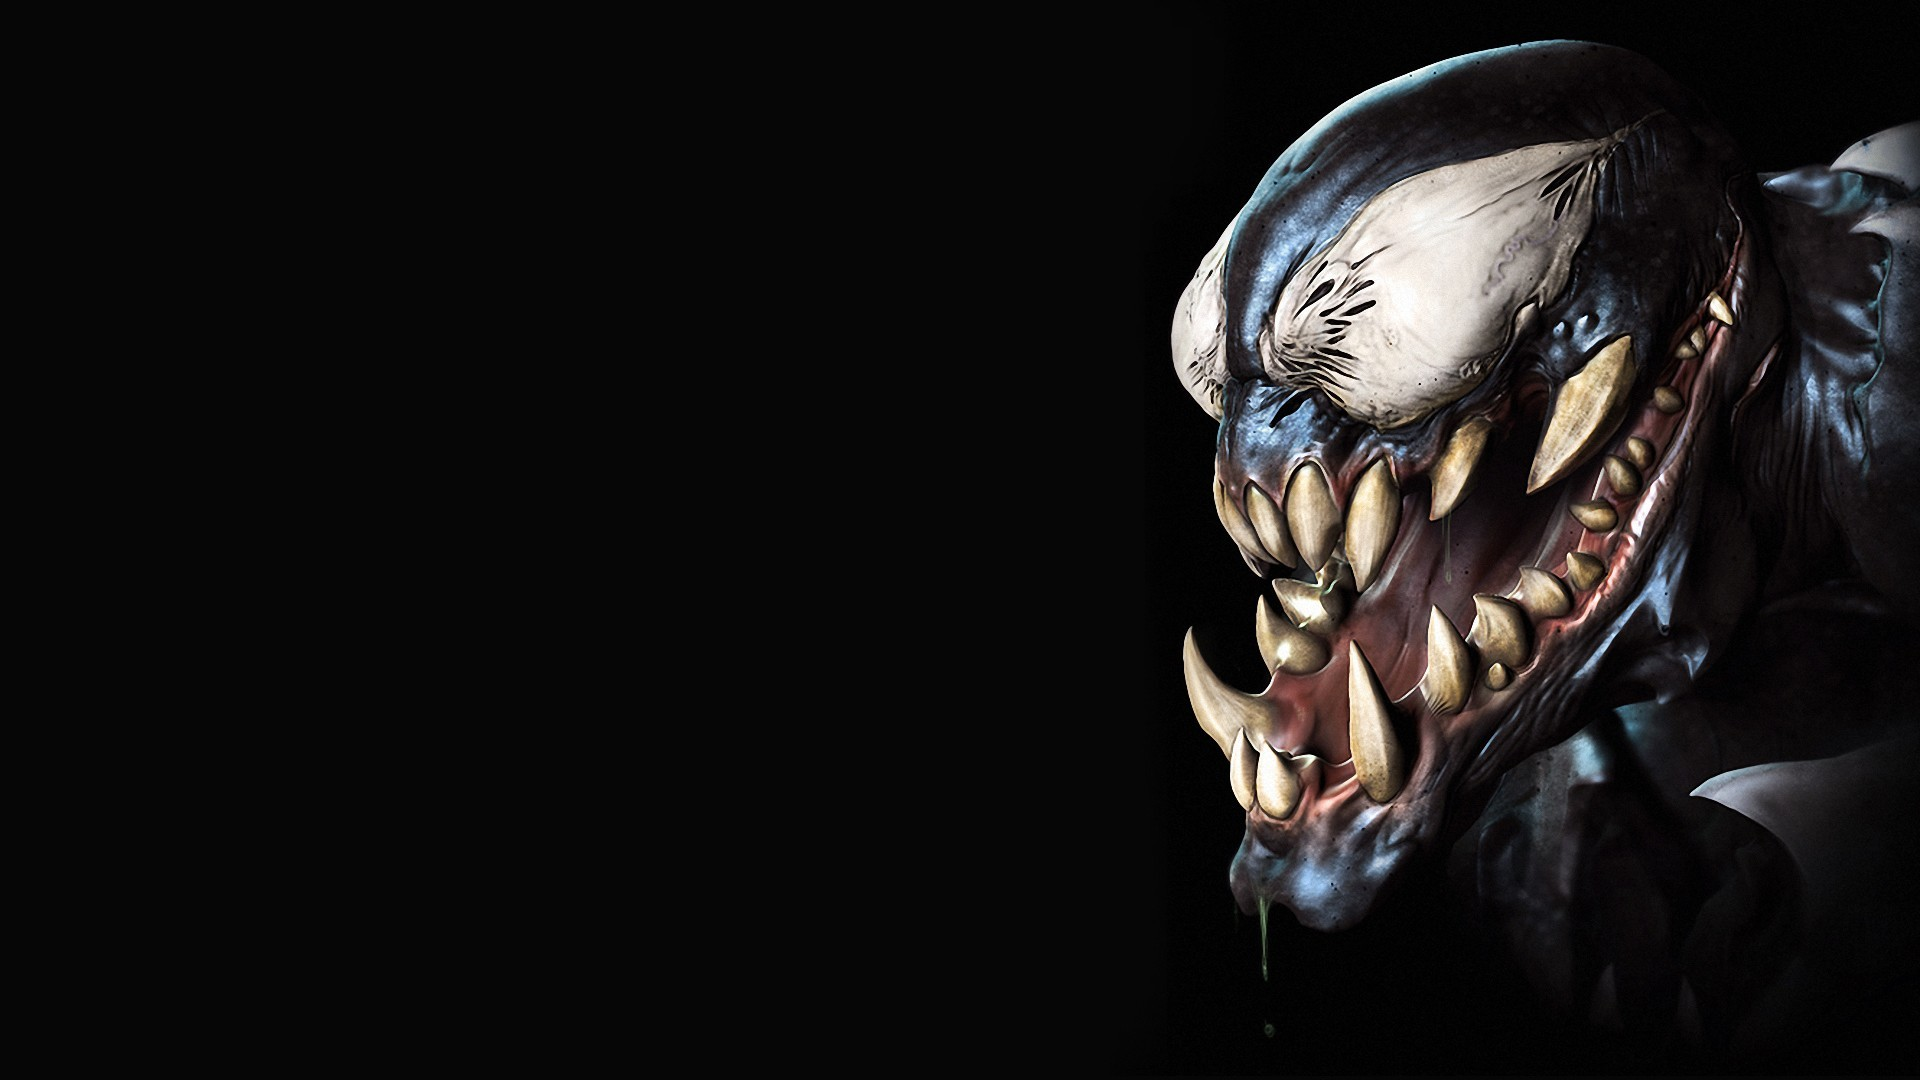 HD Agent Venom Wallpaper | WallpaperSafari